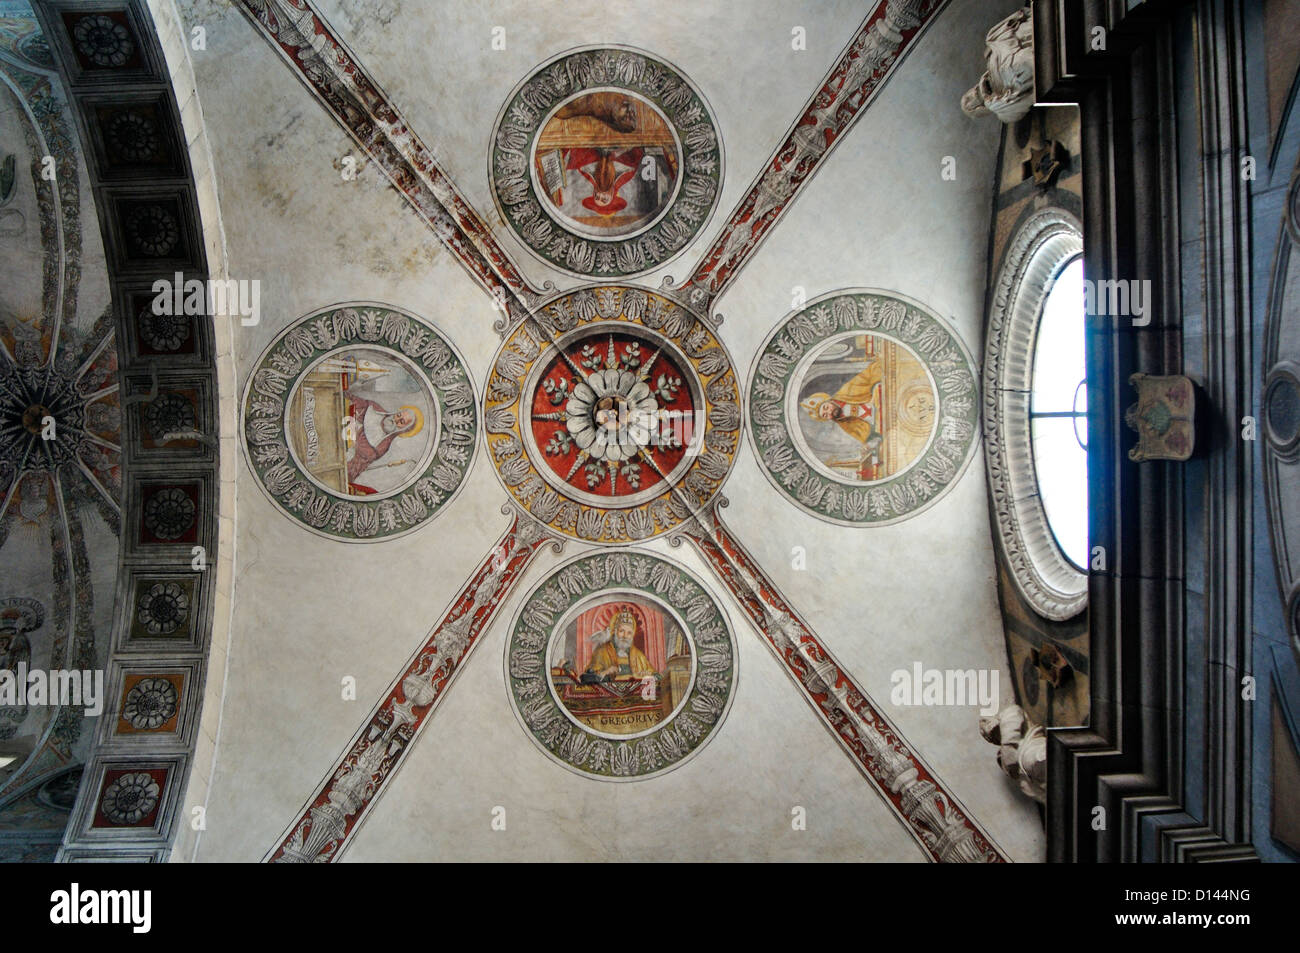 Italia, Venecia, Verona, Iglesia de Santa Maria in Organo, fresco de techo Imagen De Stock